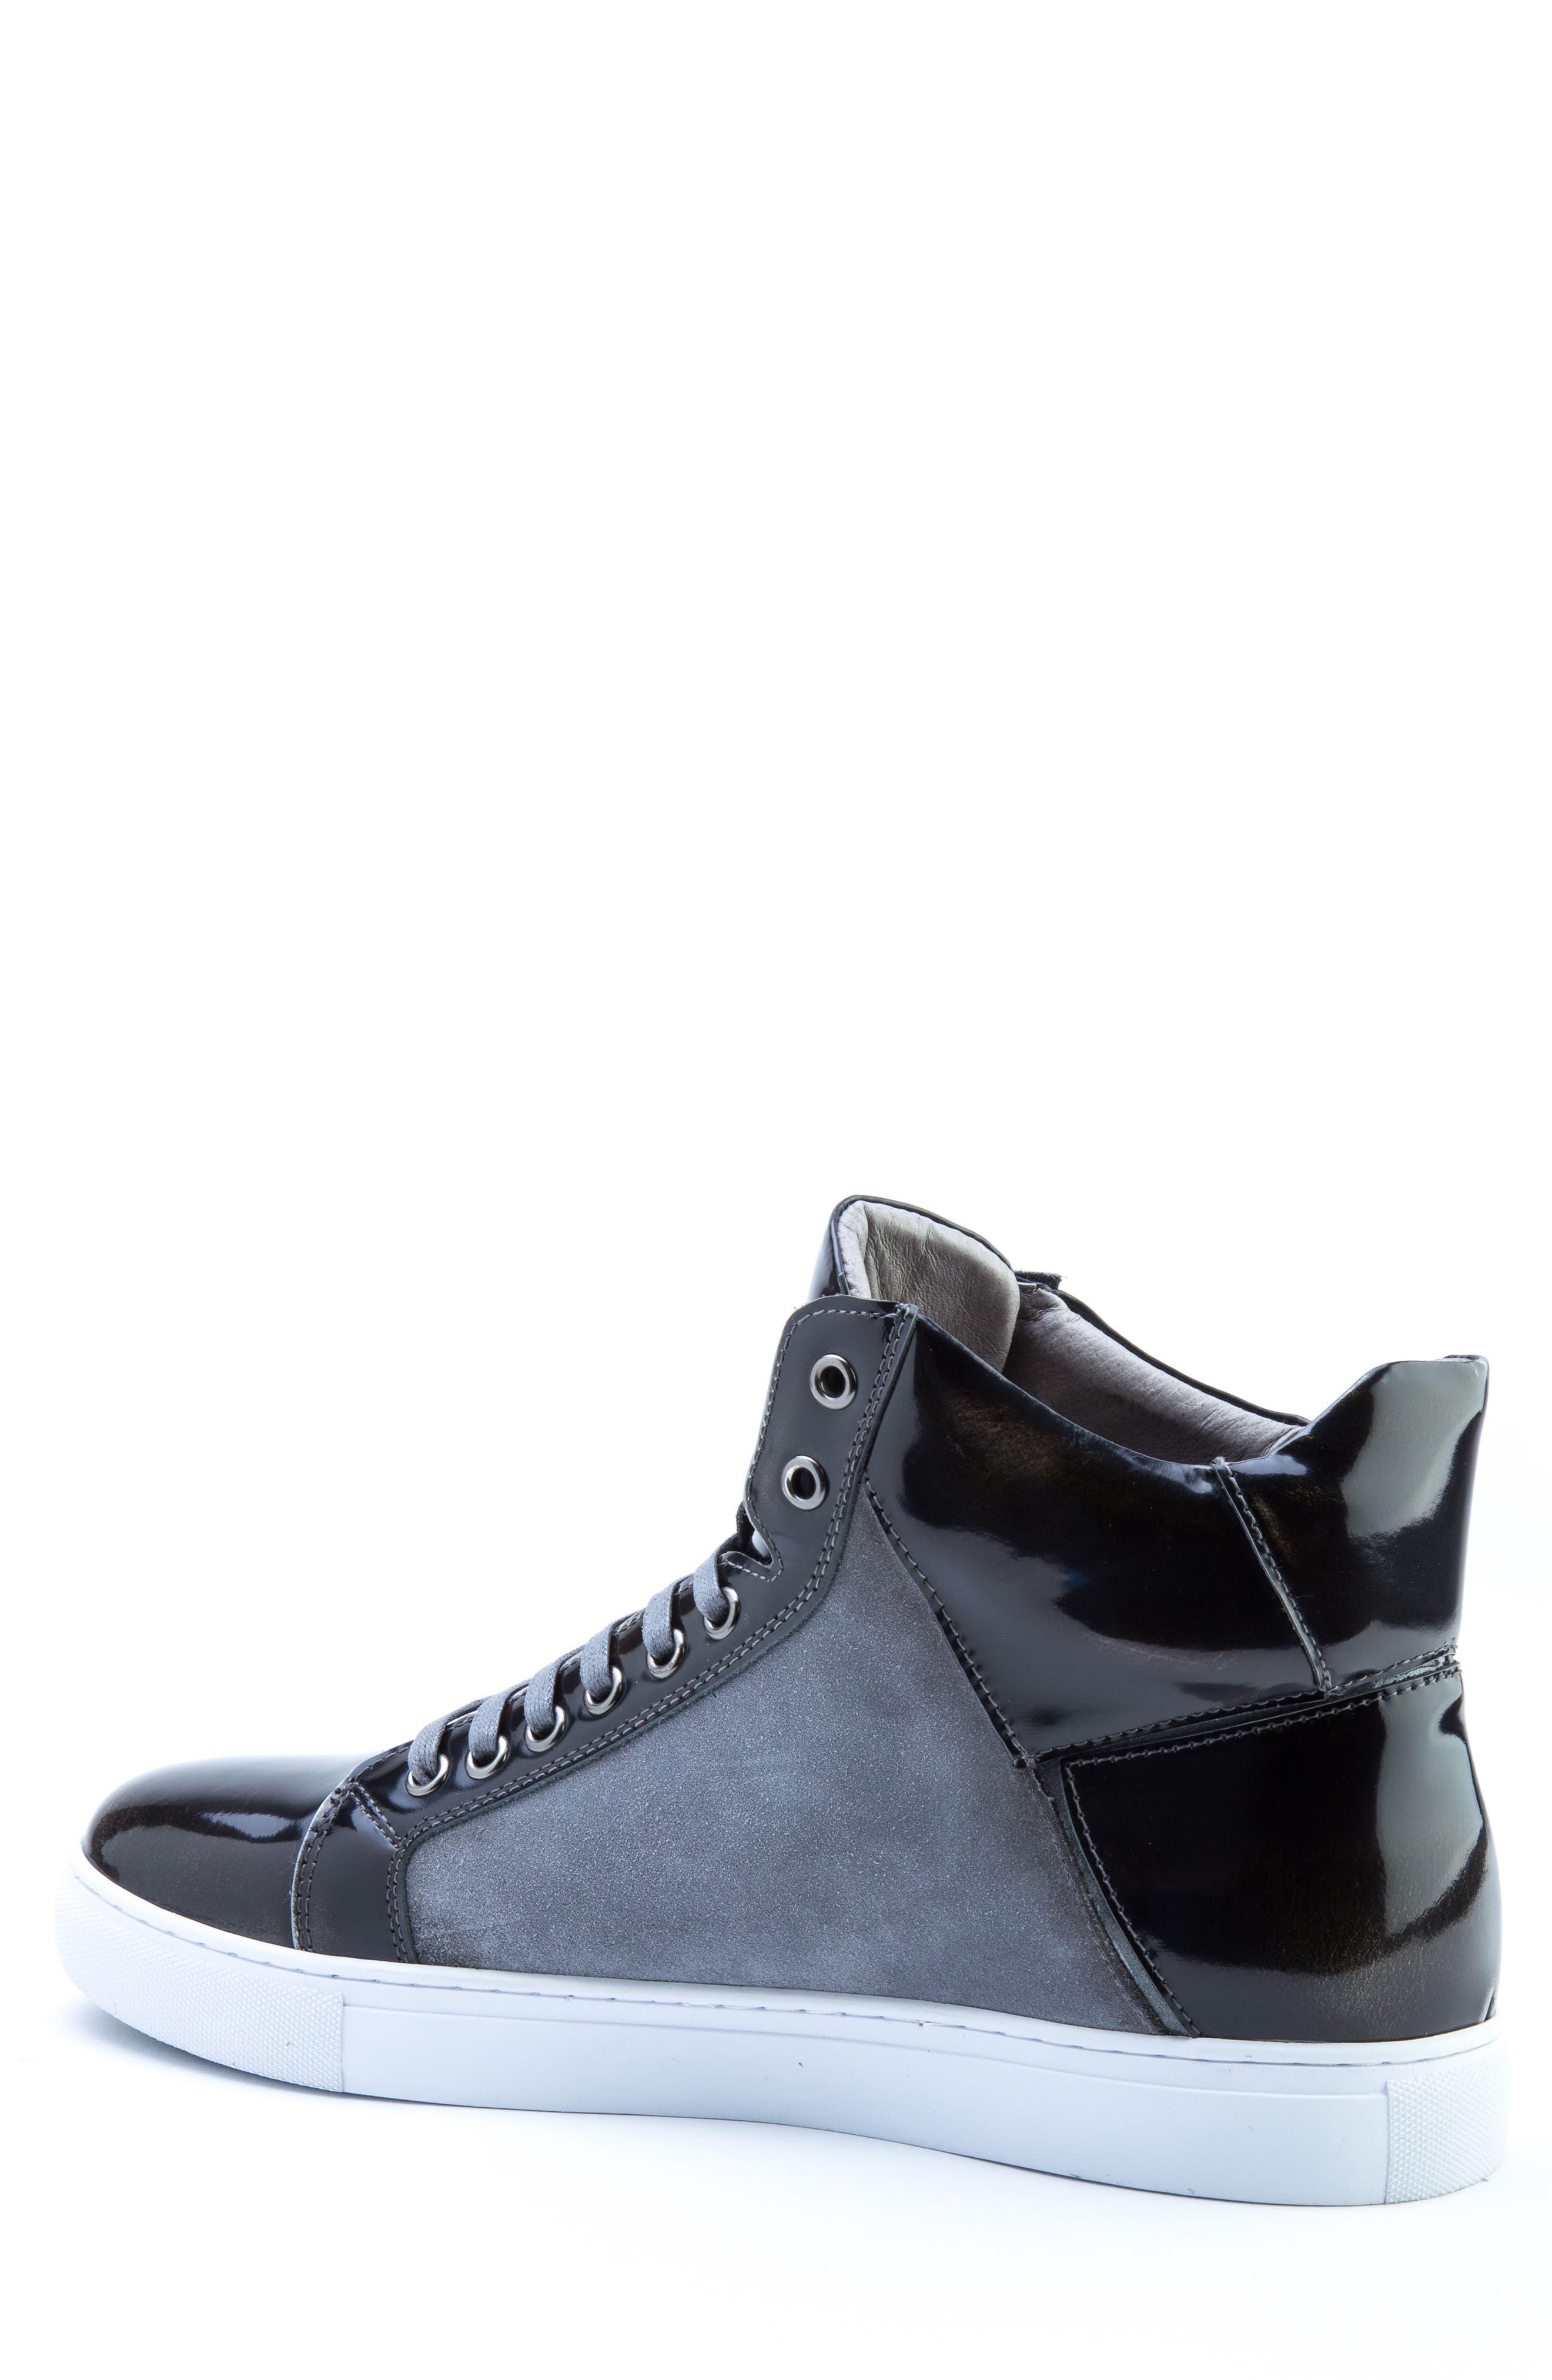 BADGLEY MISCHKA COLLECTION, Badgley Mischka Douglas High Top Sneaker, Alternate thumbnail 2, color, 001